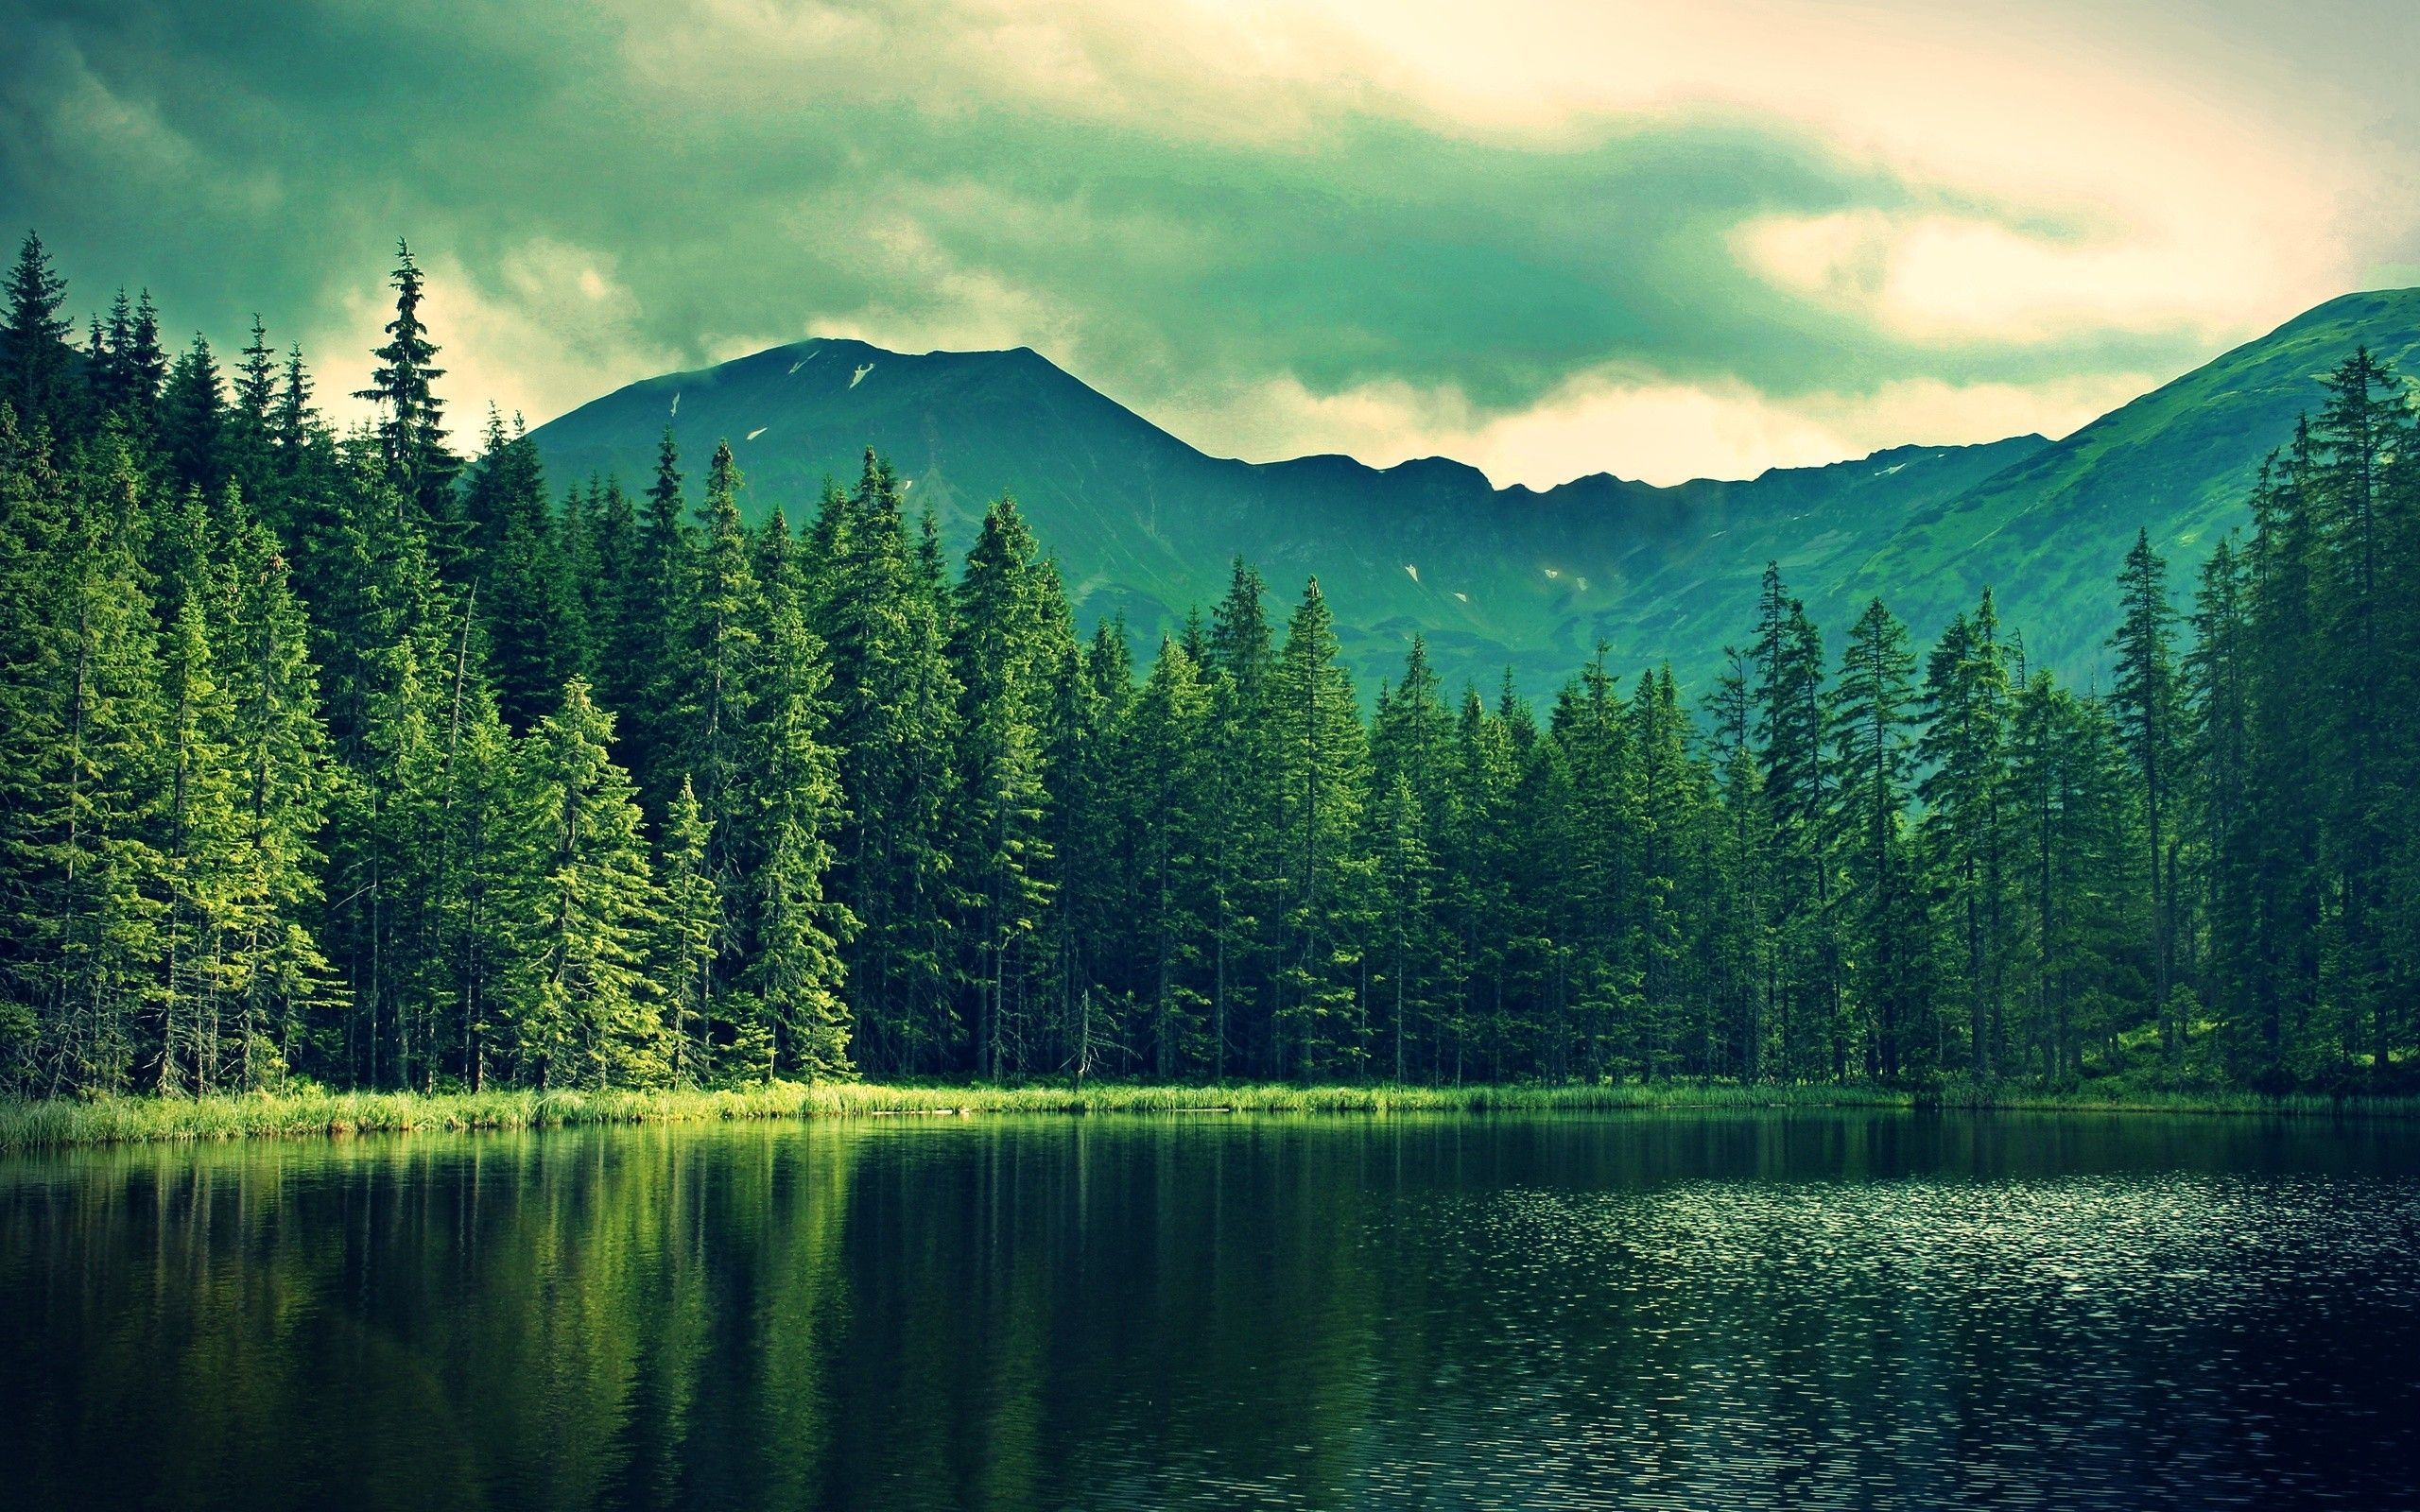 Mountains Lake Pond Water Hills Trees Landscape Nature Wallpaper Lake Landscape Forest Wallpaper Nature Wallpaper